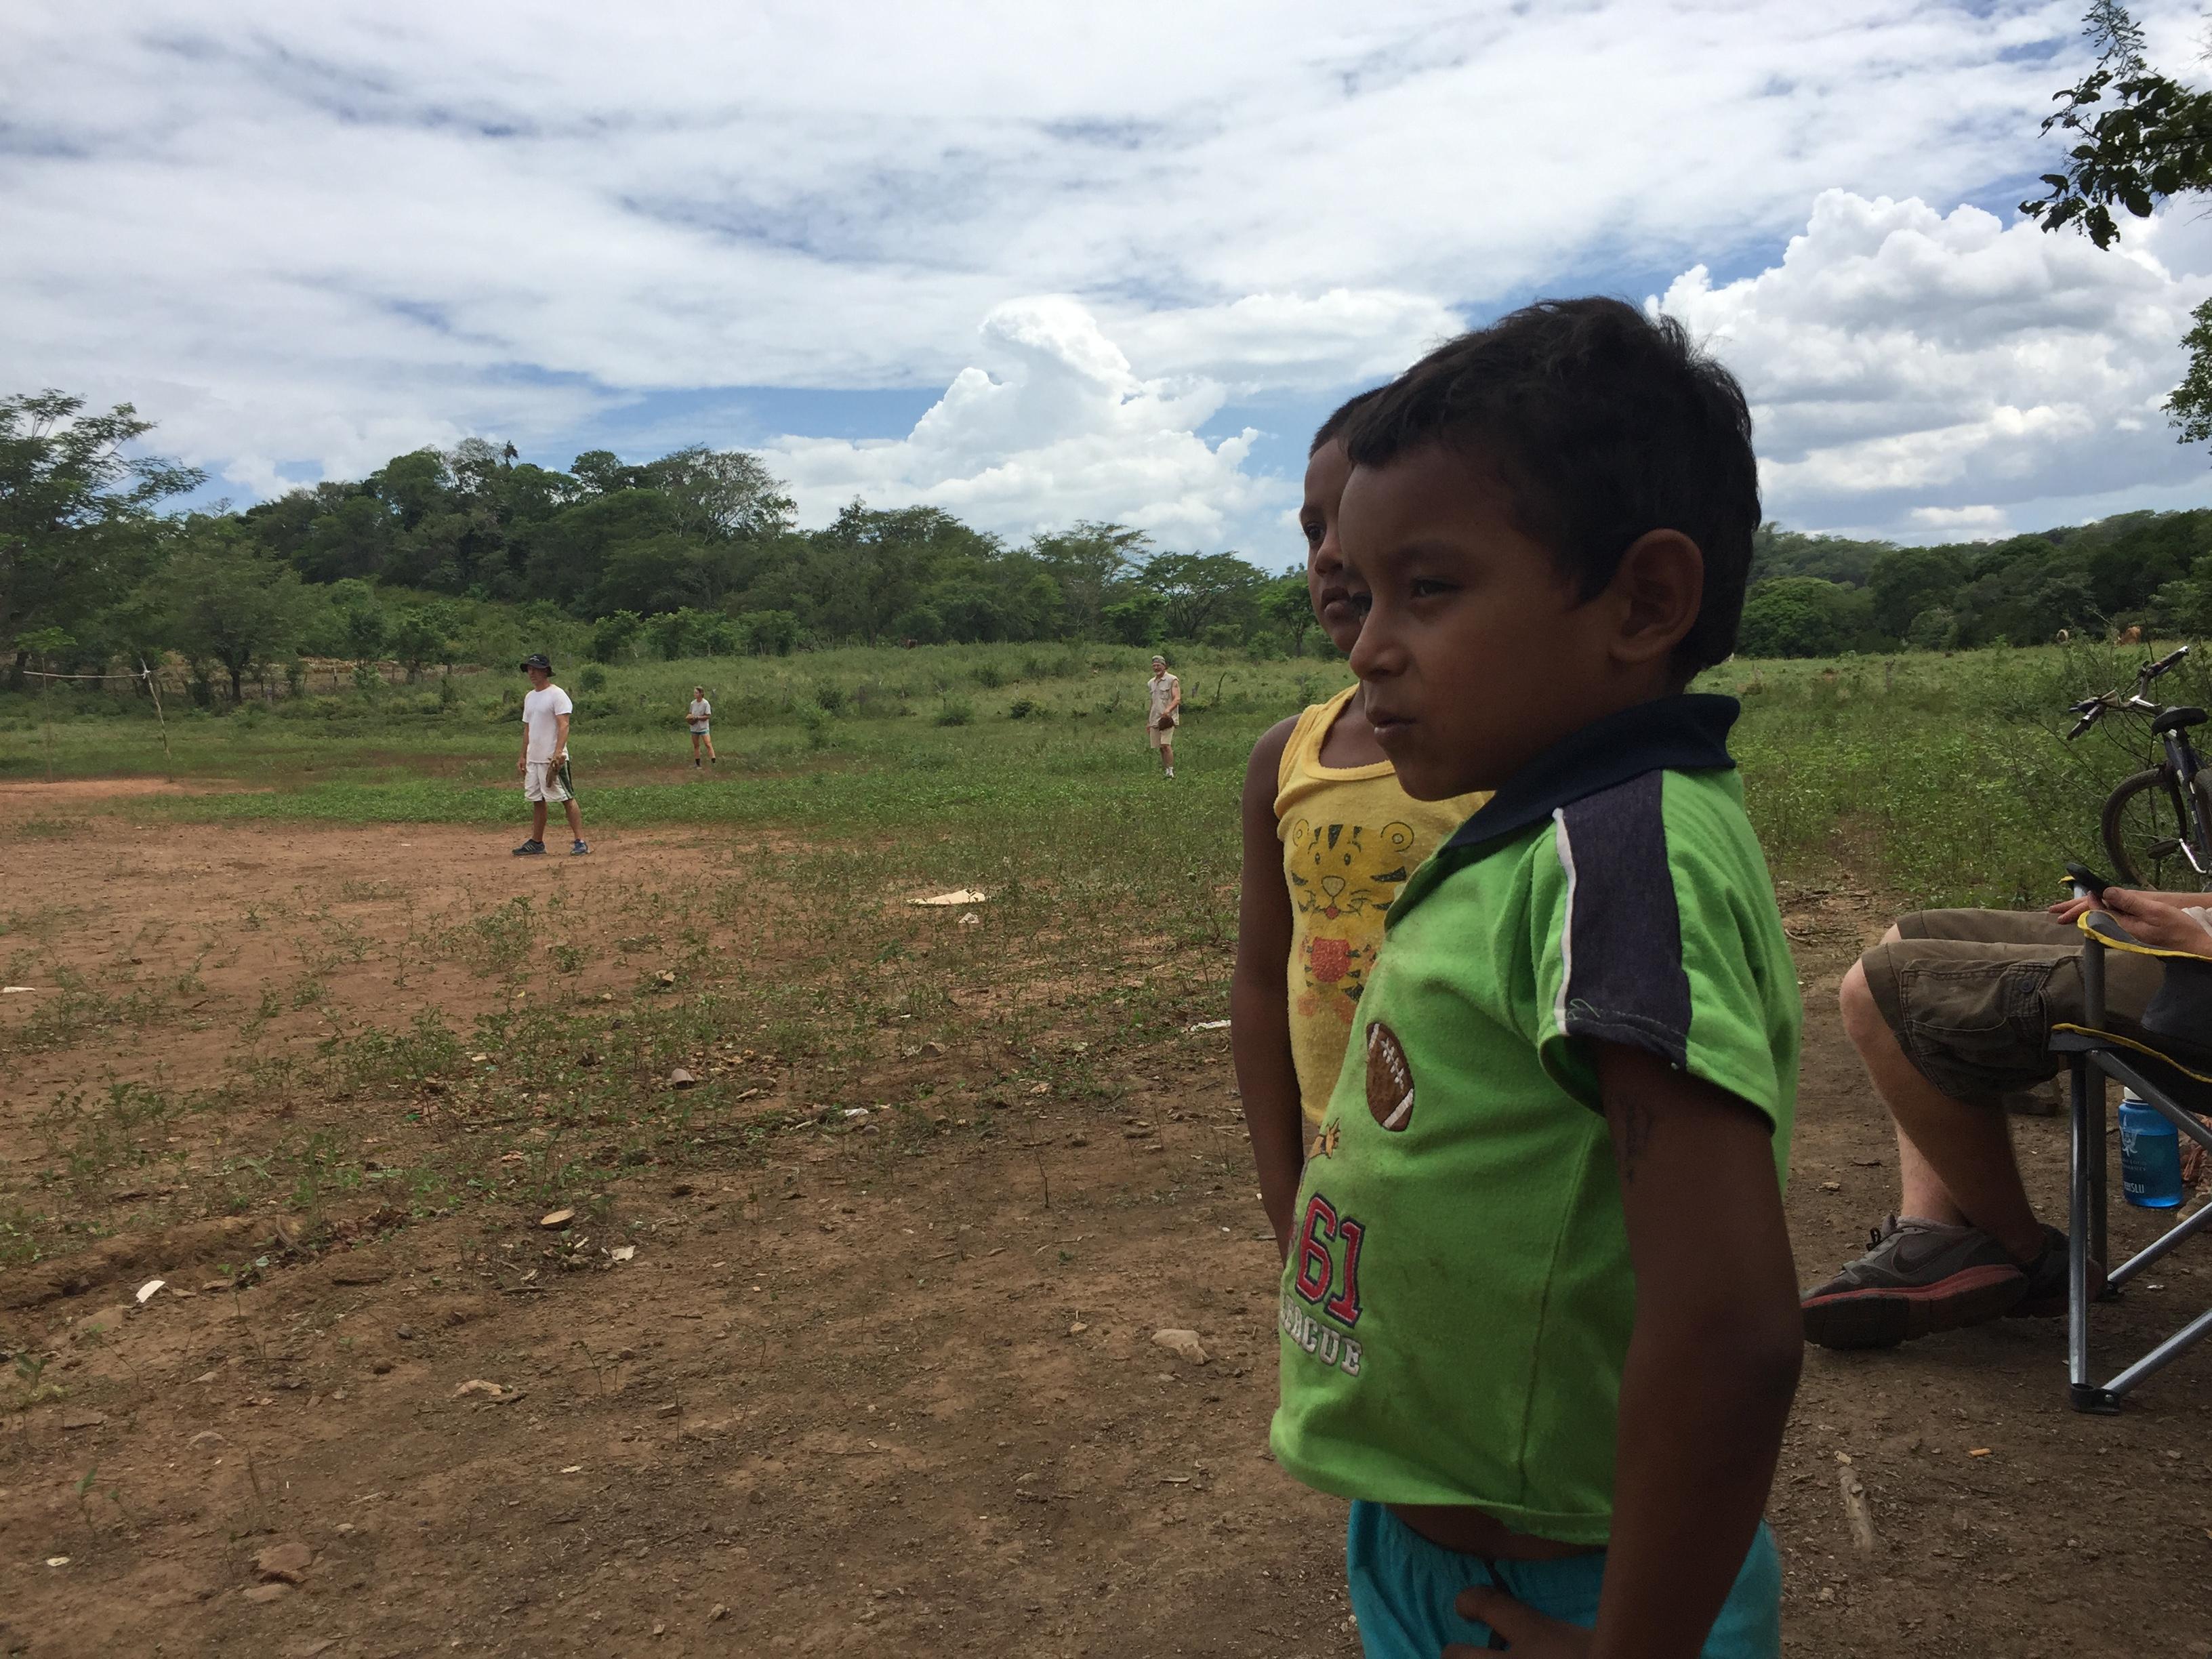 nicaragua matilde kid